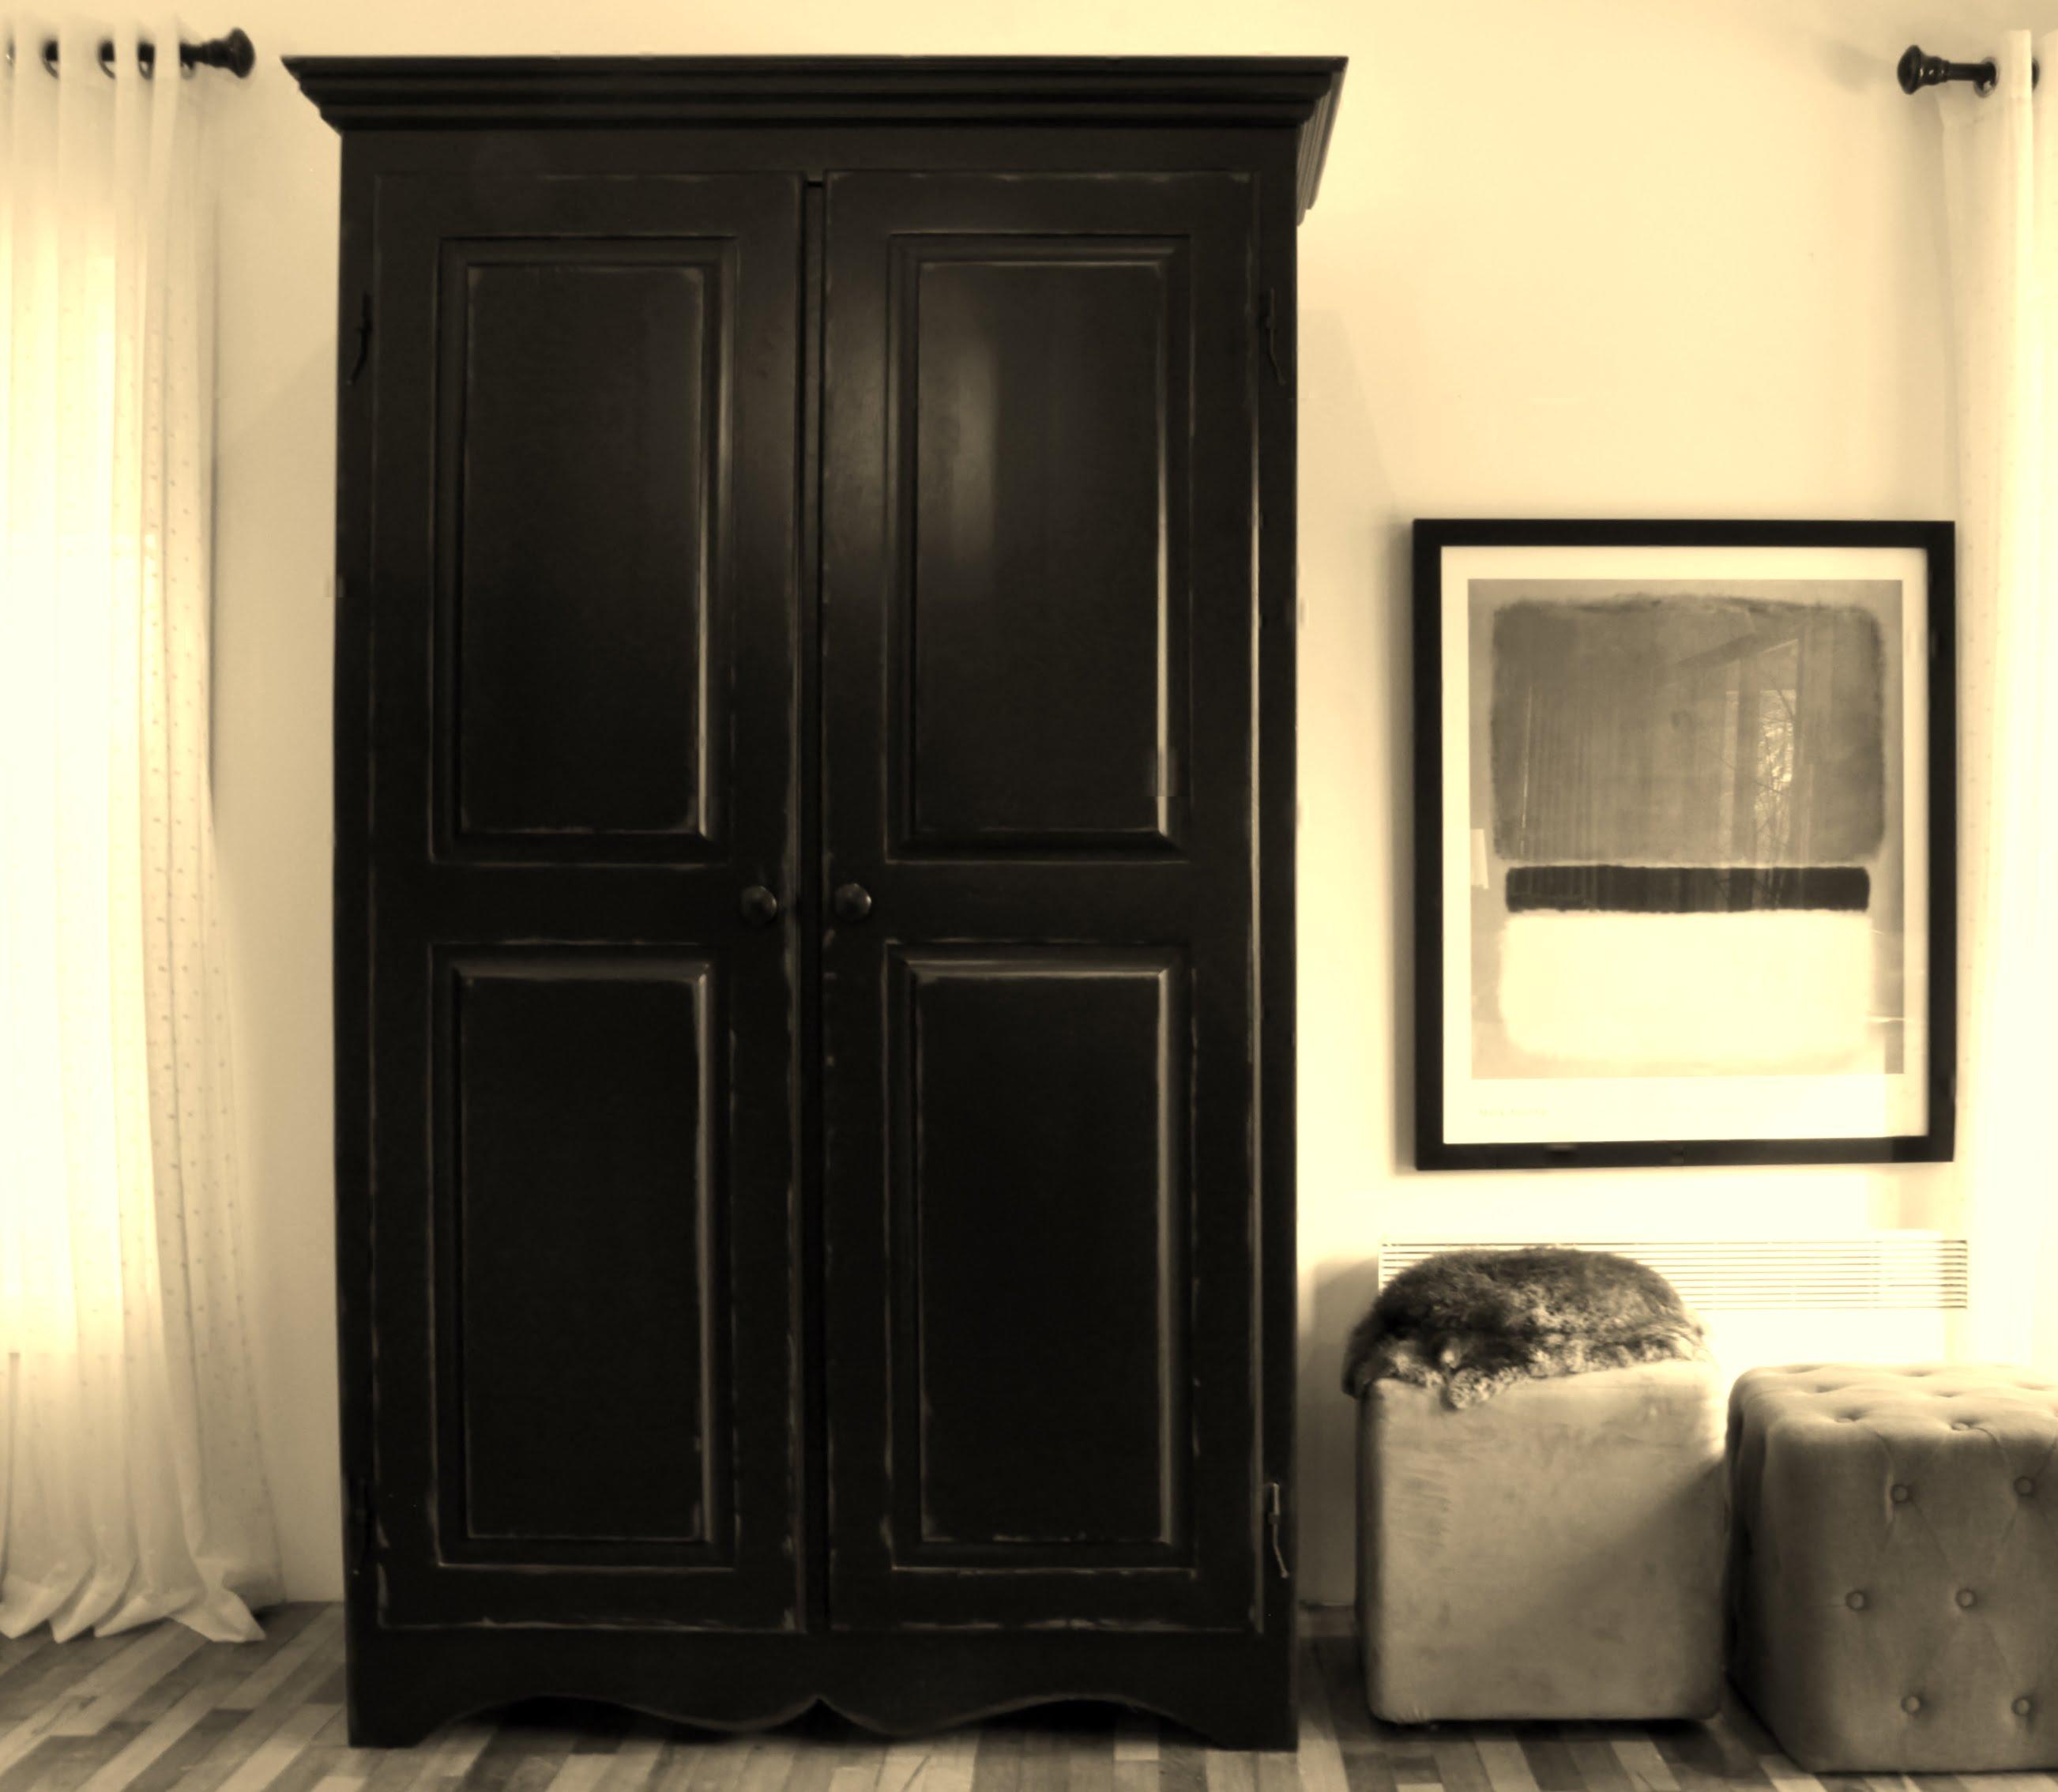 Armoire noir 2 meubles sur mesure meubles hochelaga for Meuble hochelaga montreal